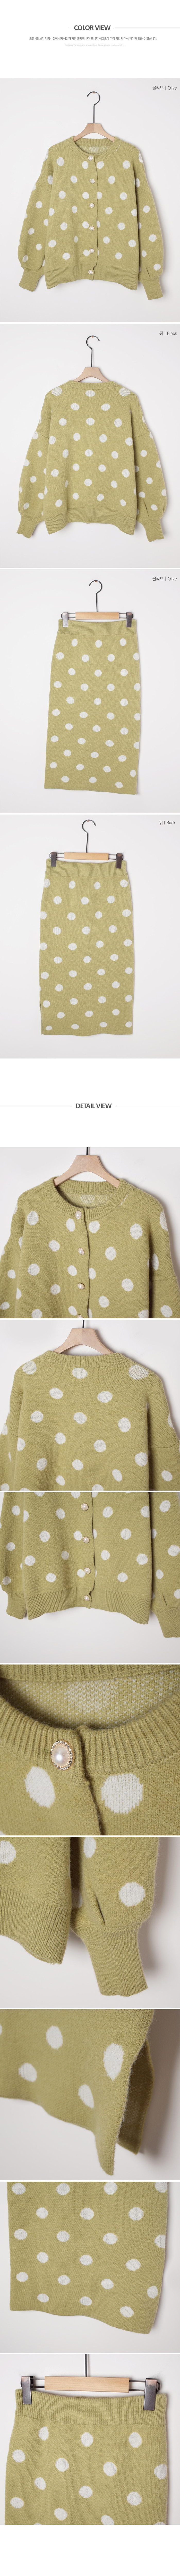 Royal Dot Pearl Cardigan + Skirt SET